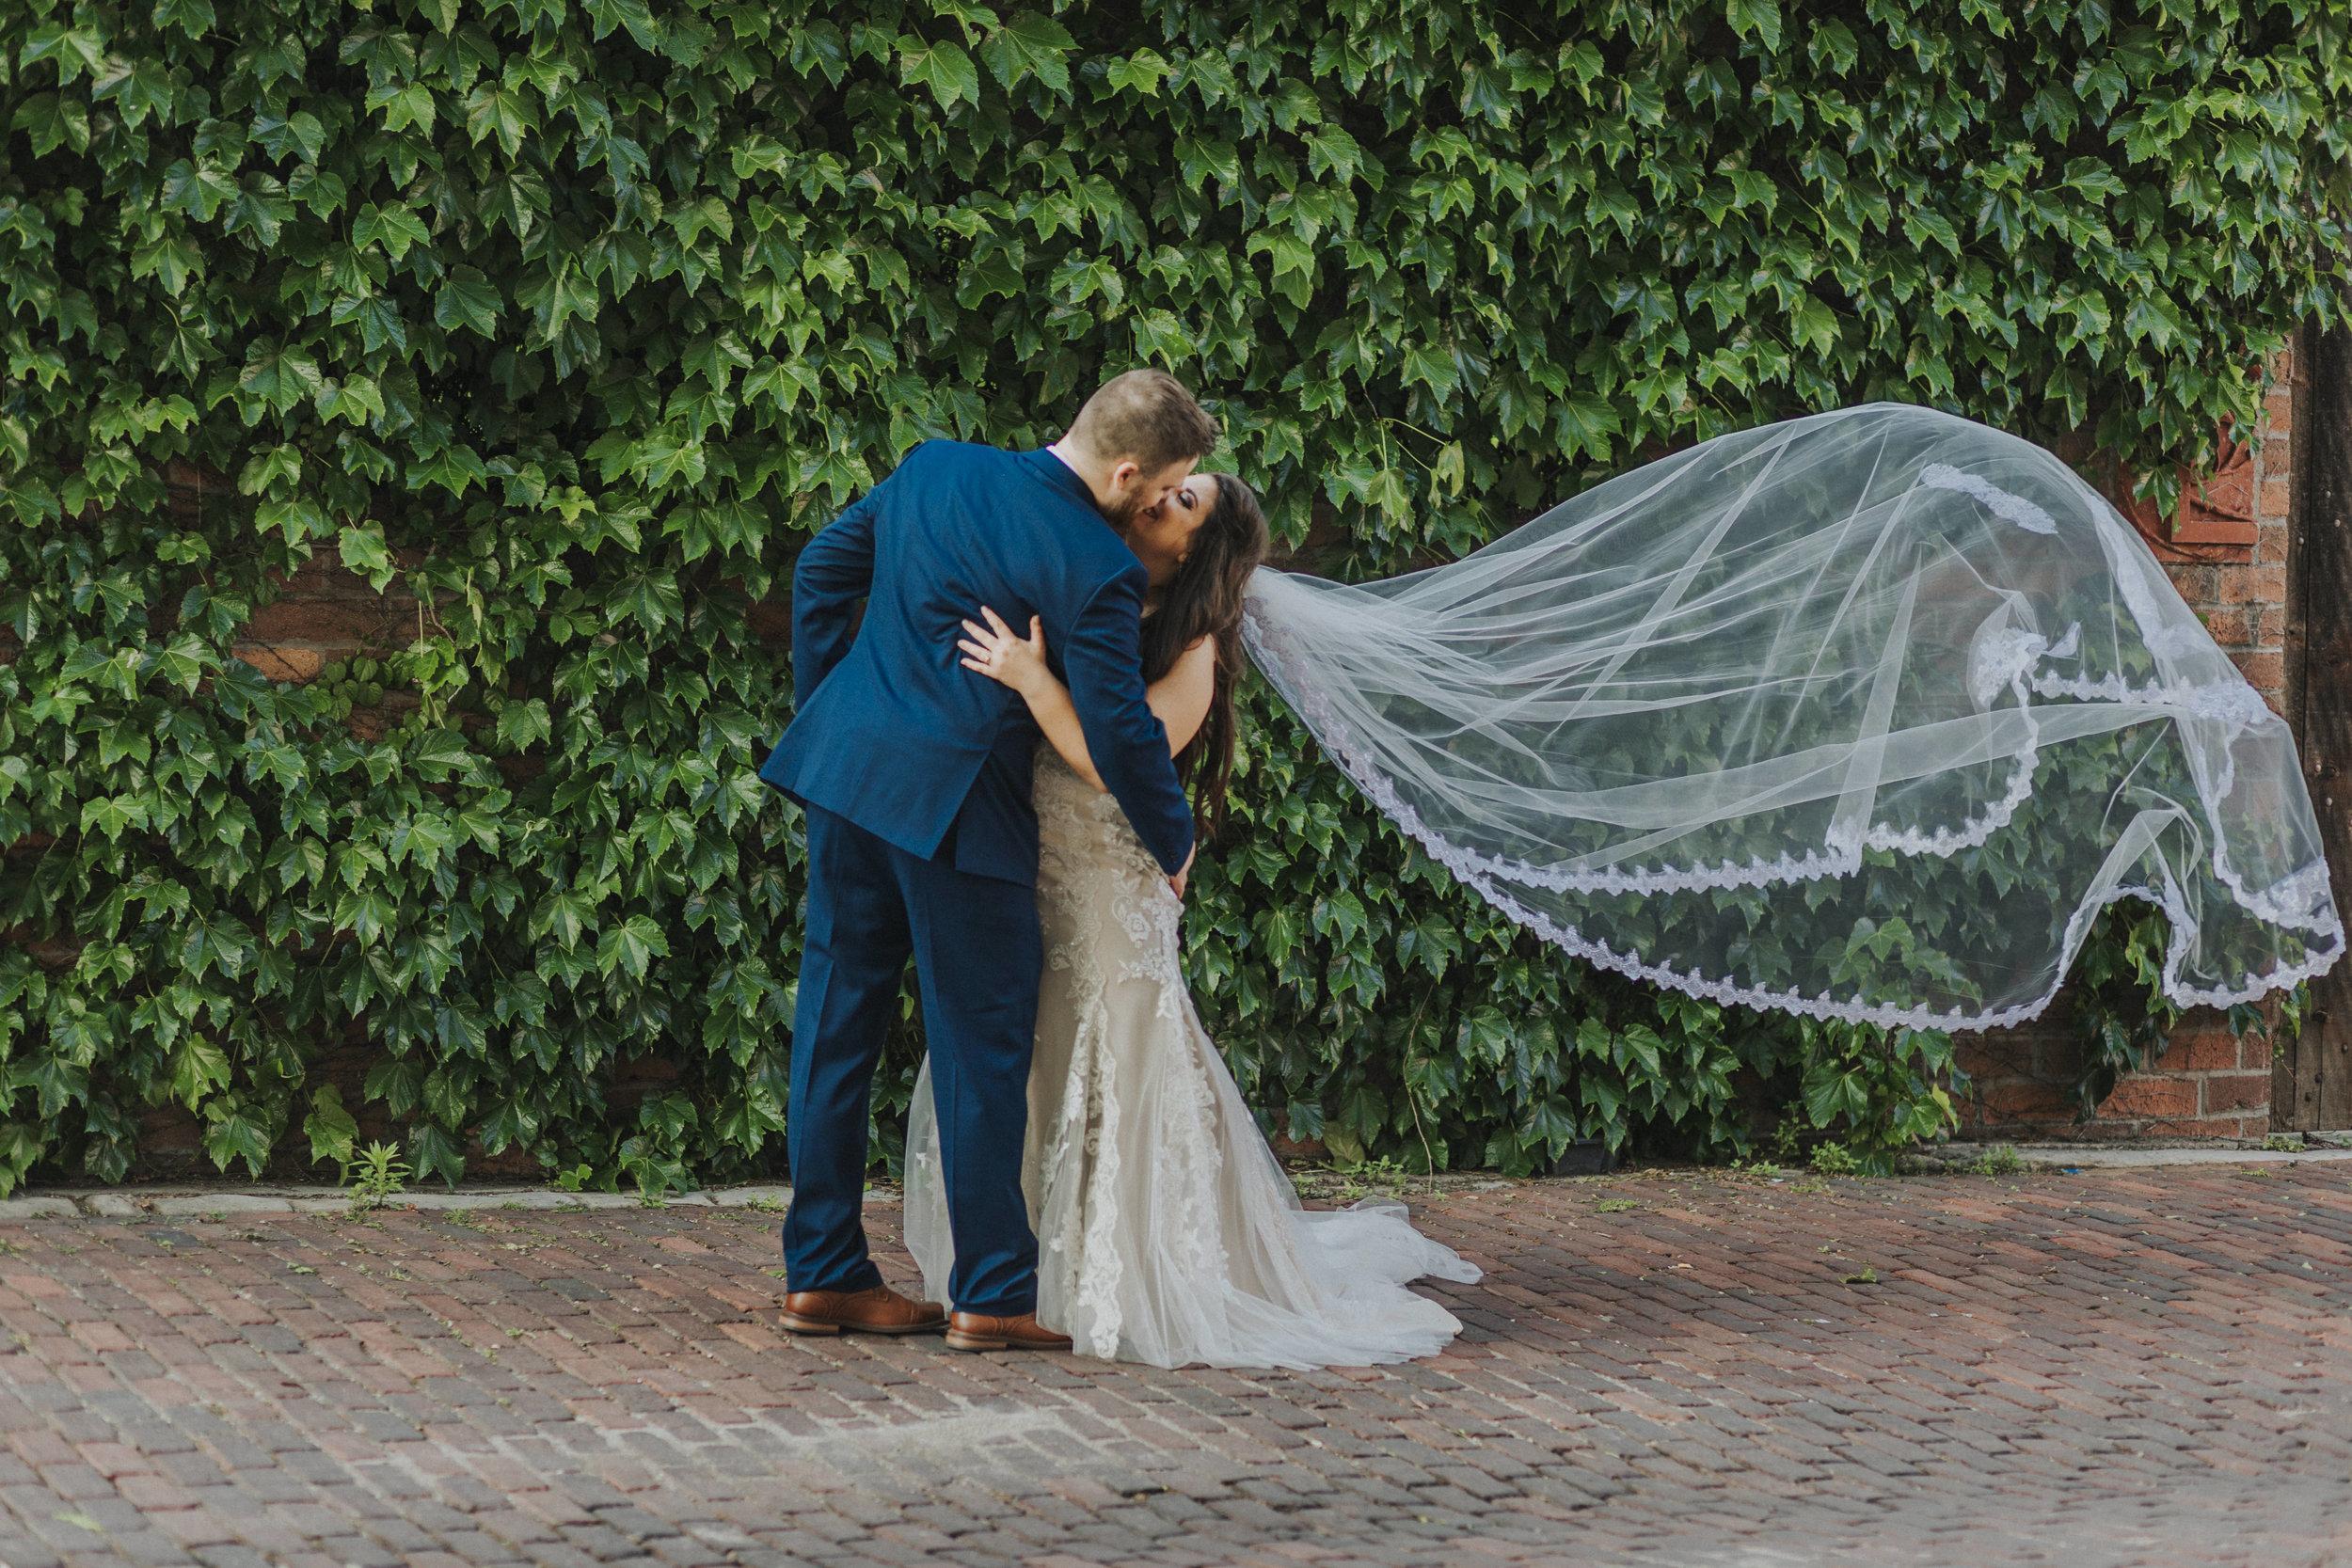 136 tiny-luxe-weddings-custom-elopement-summer-omaha-old-market.jpg